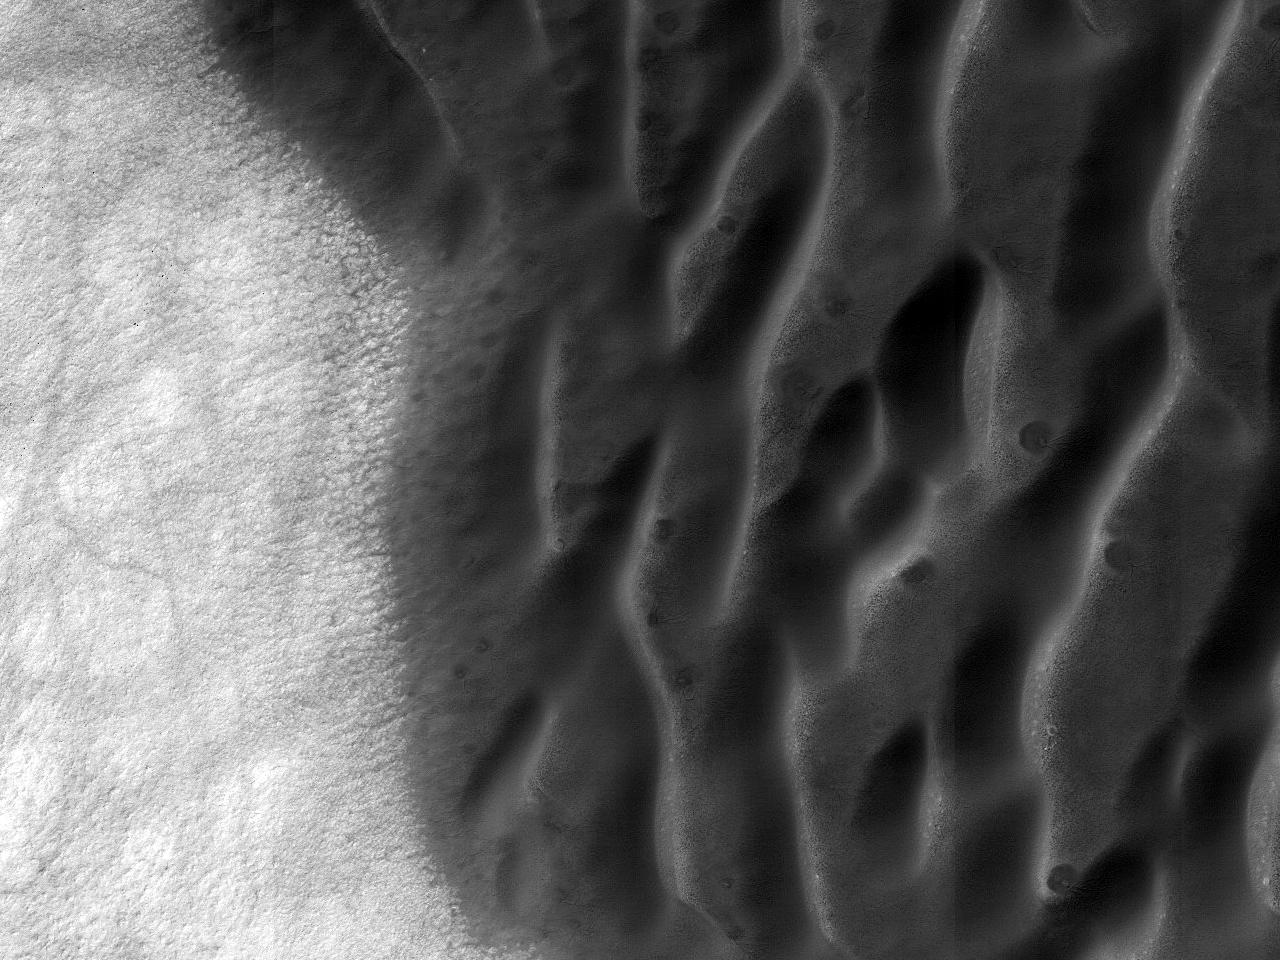 Dune și teren deschis la culoare